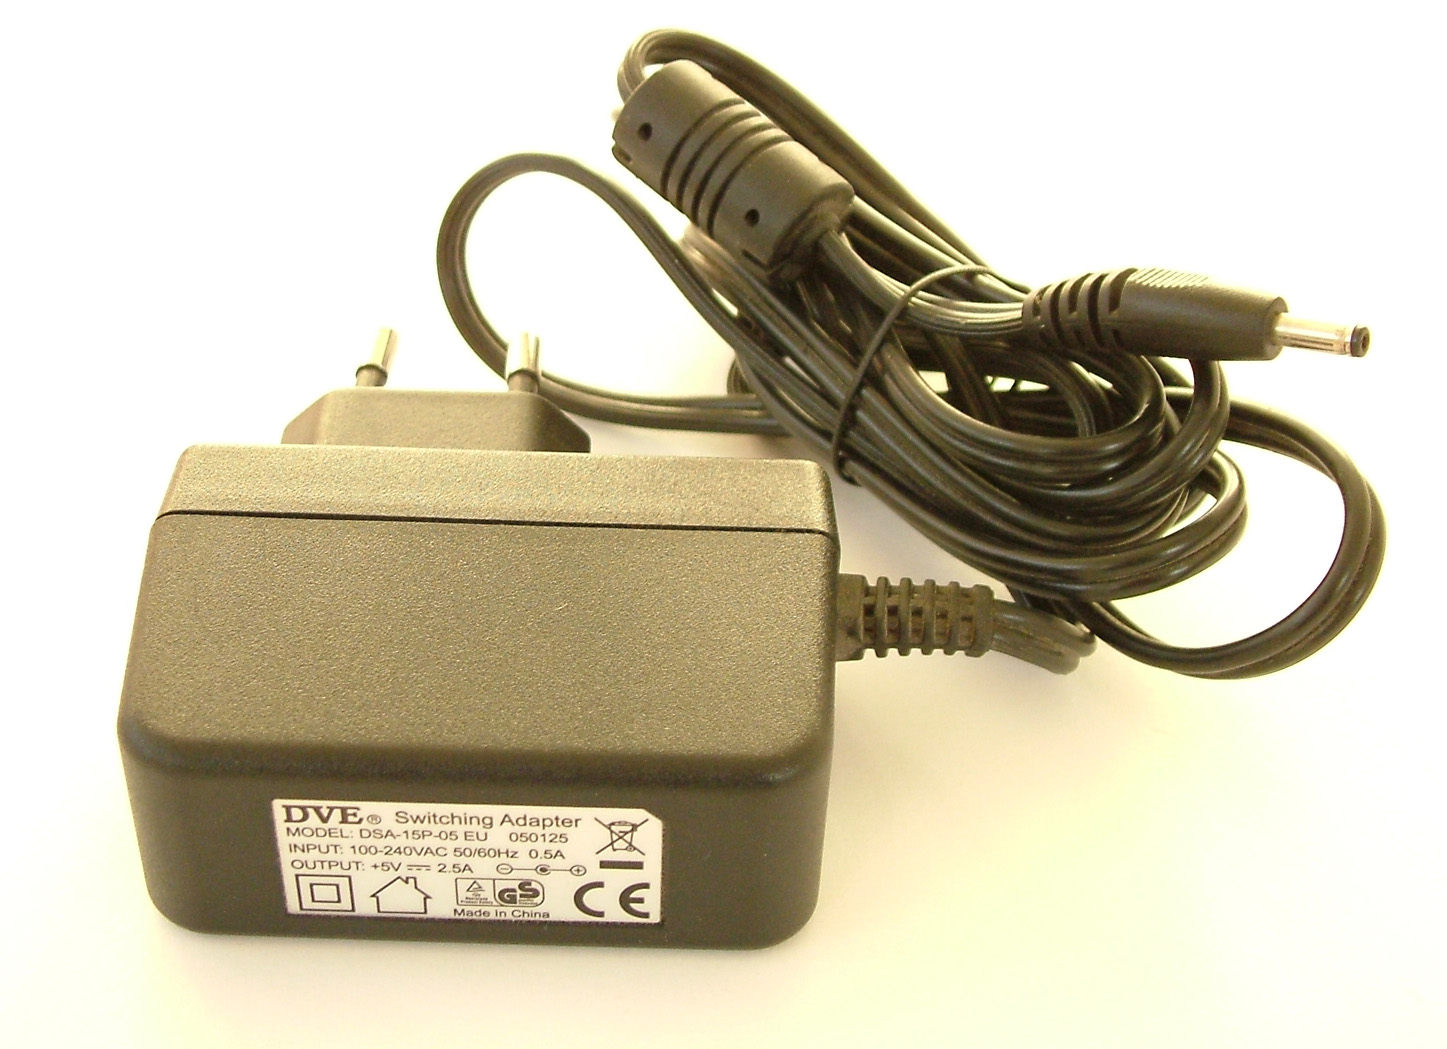 Napaječ pro i-tec Express card 2x USB 3.0